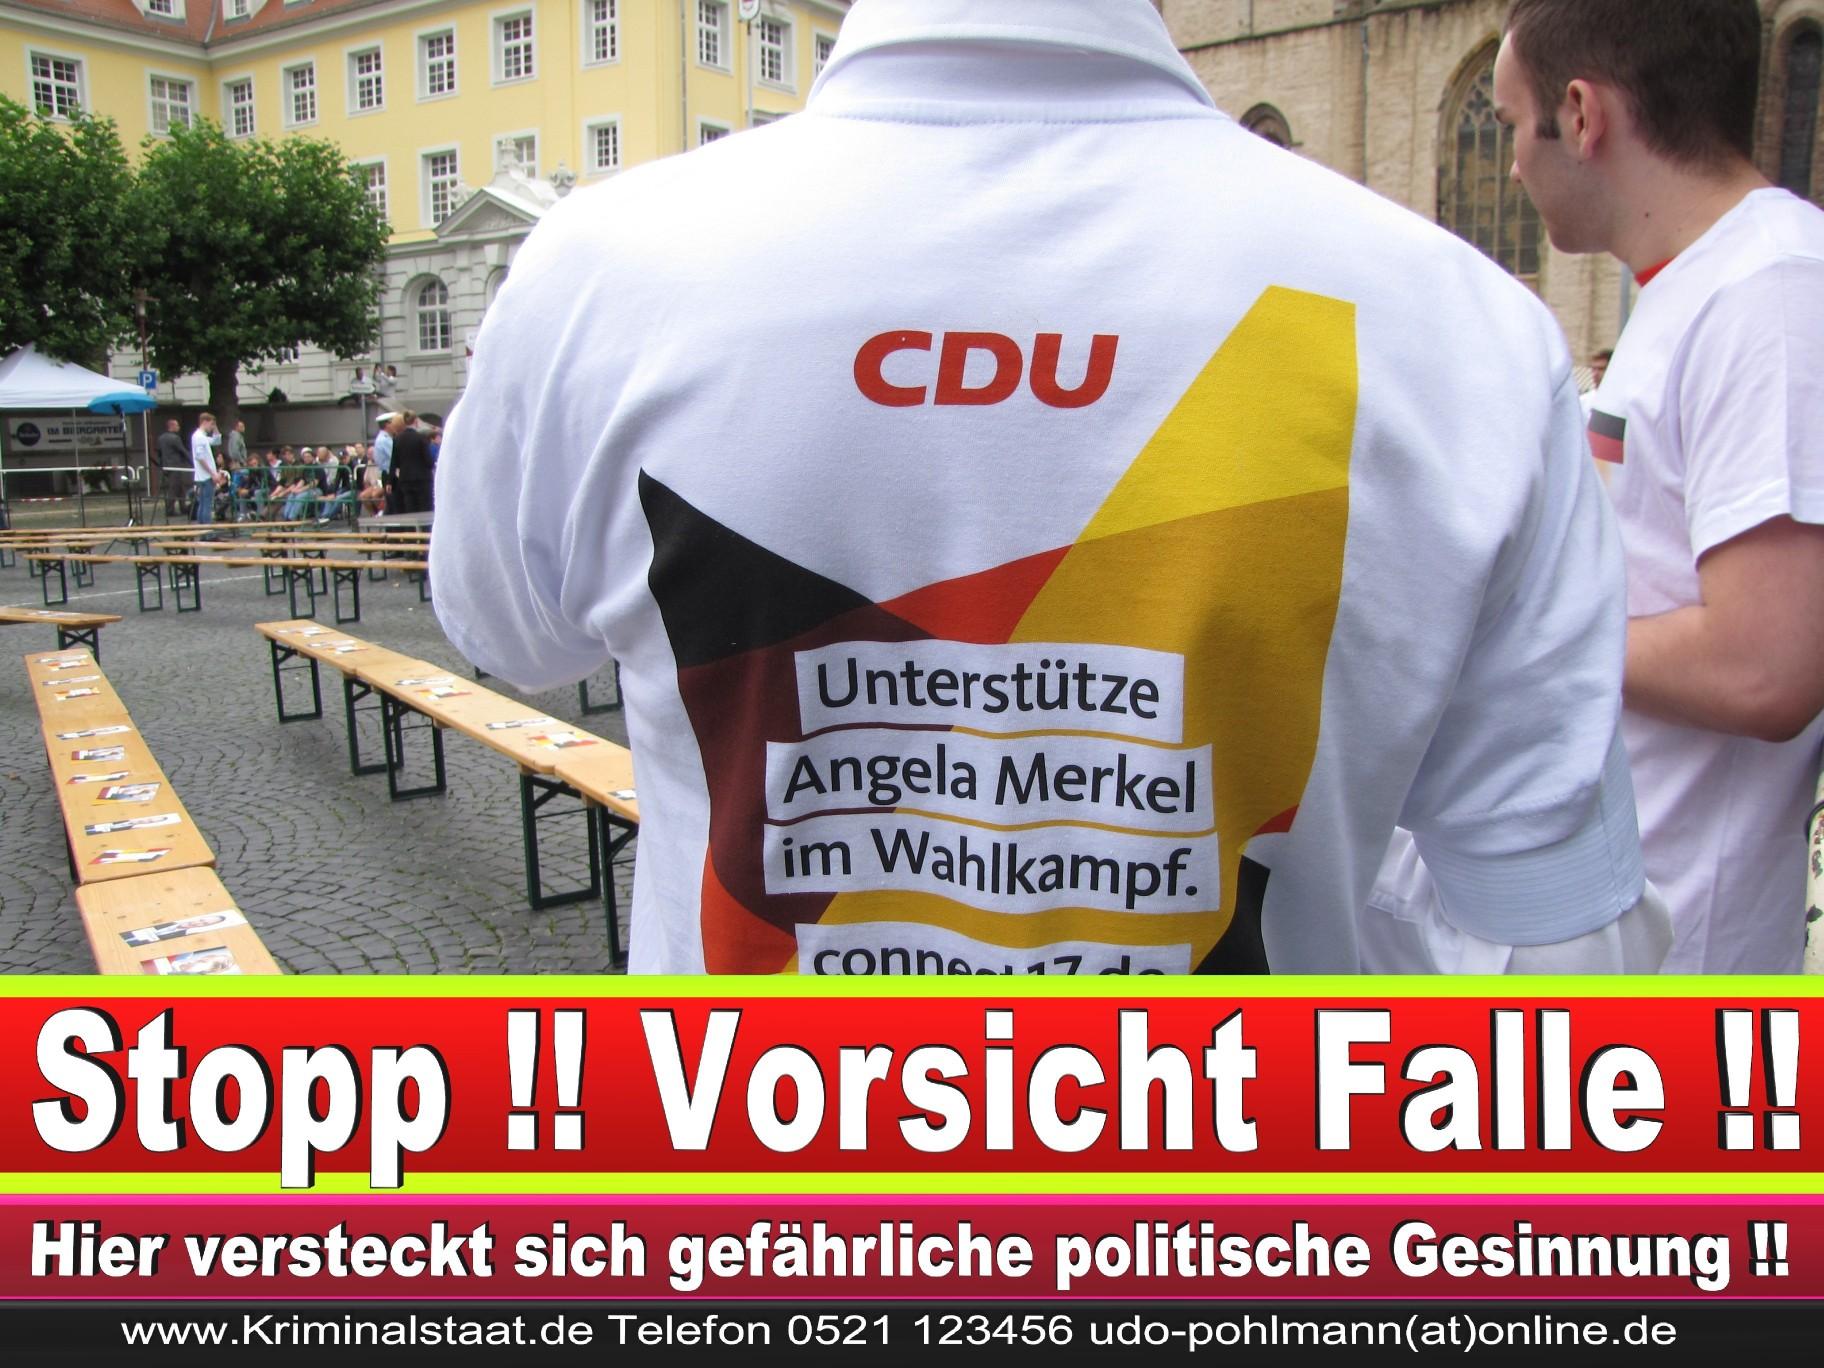 CDU HERFORD Kurruption Betrug Kinderpornografie Kinderpornos 8